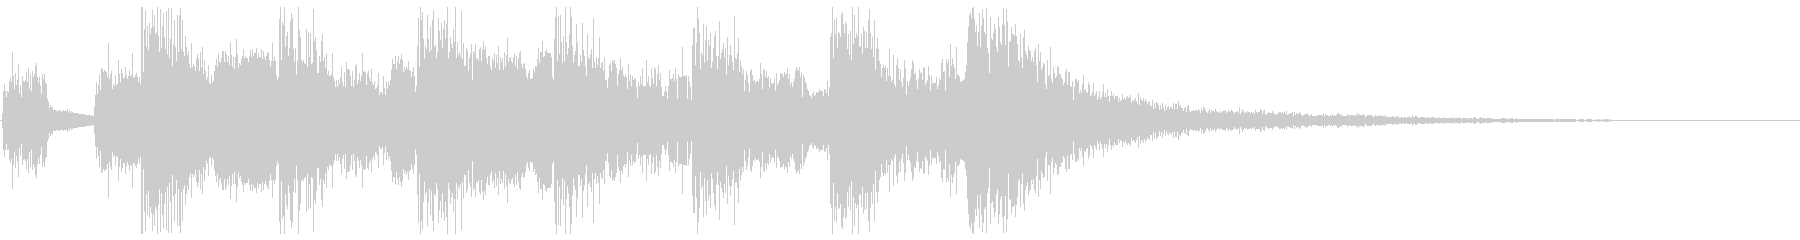 FMラジオジングル_パロディ_01の未再生の波形